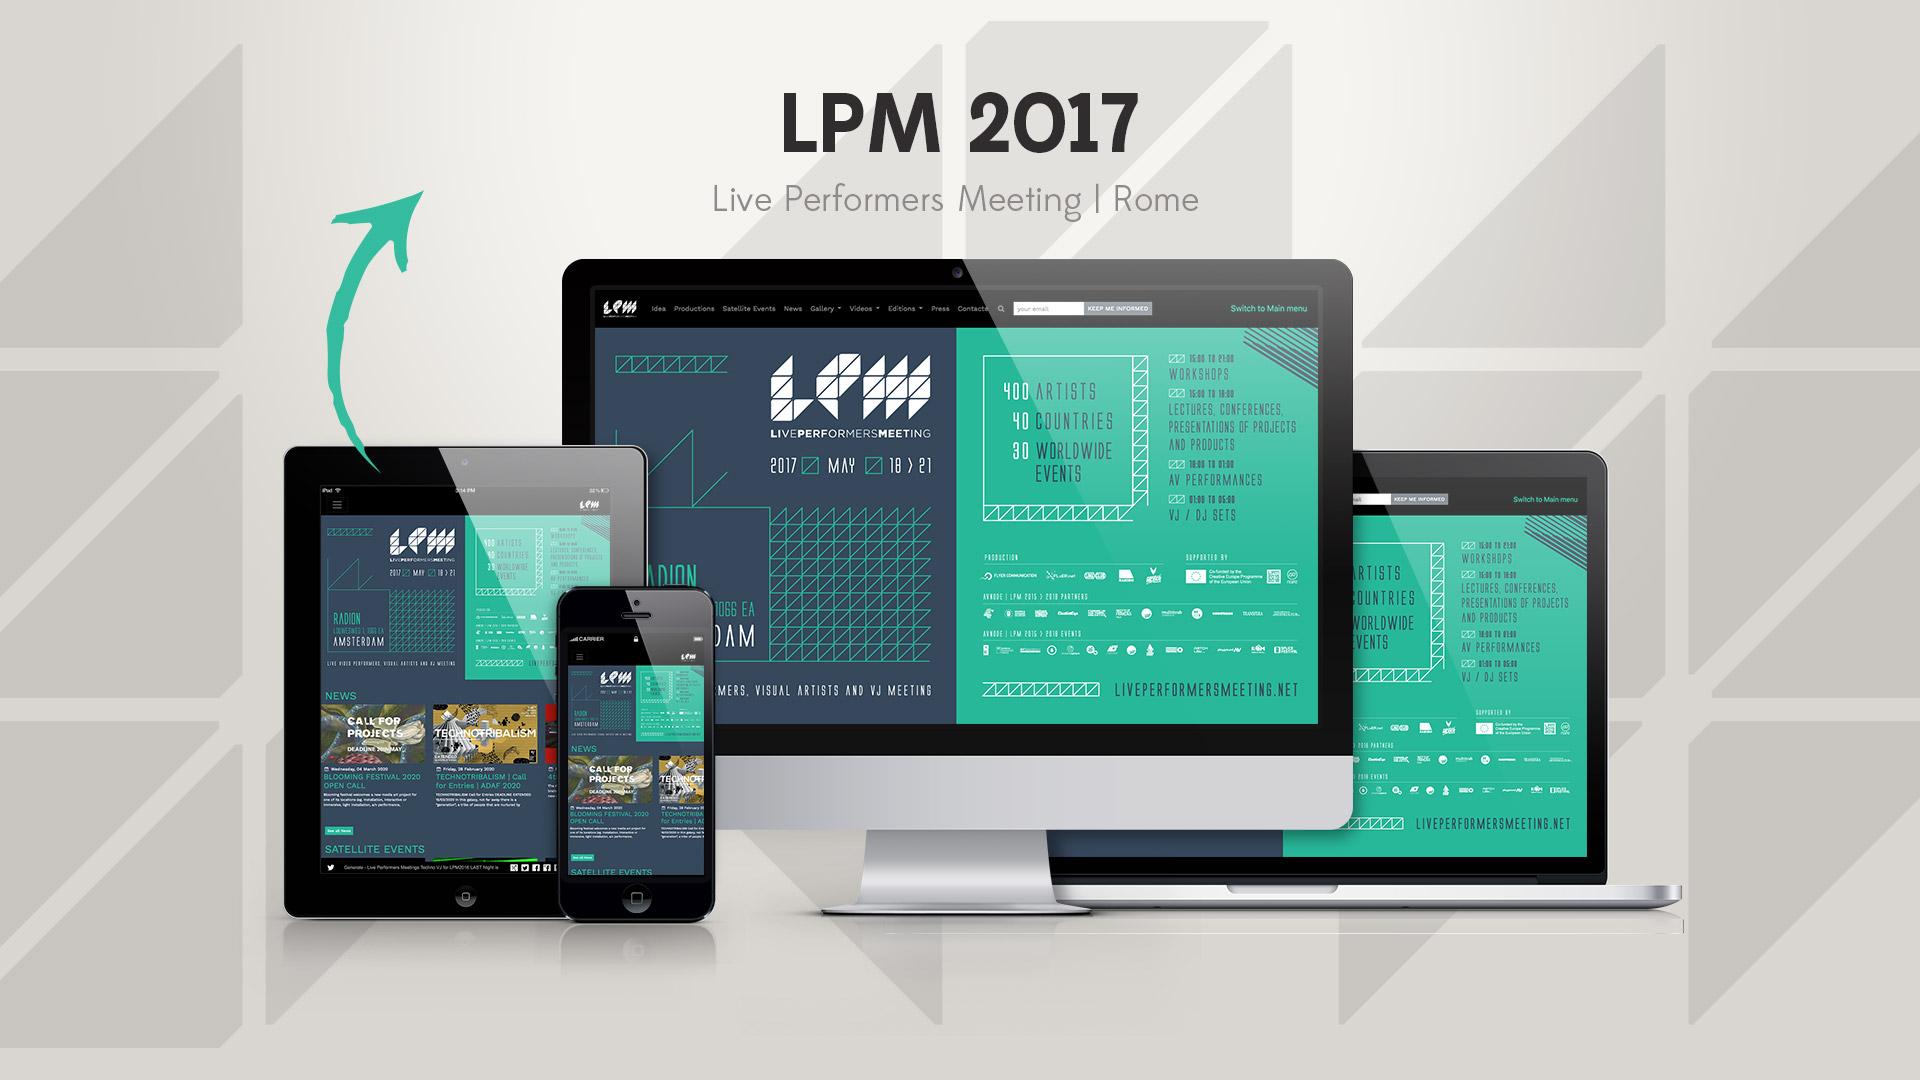 LPM 2017 Amsterdam – Web Site